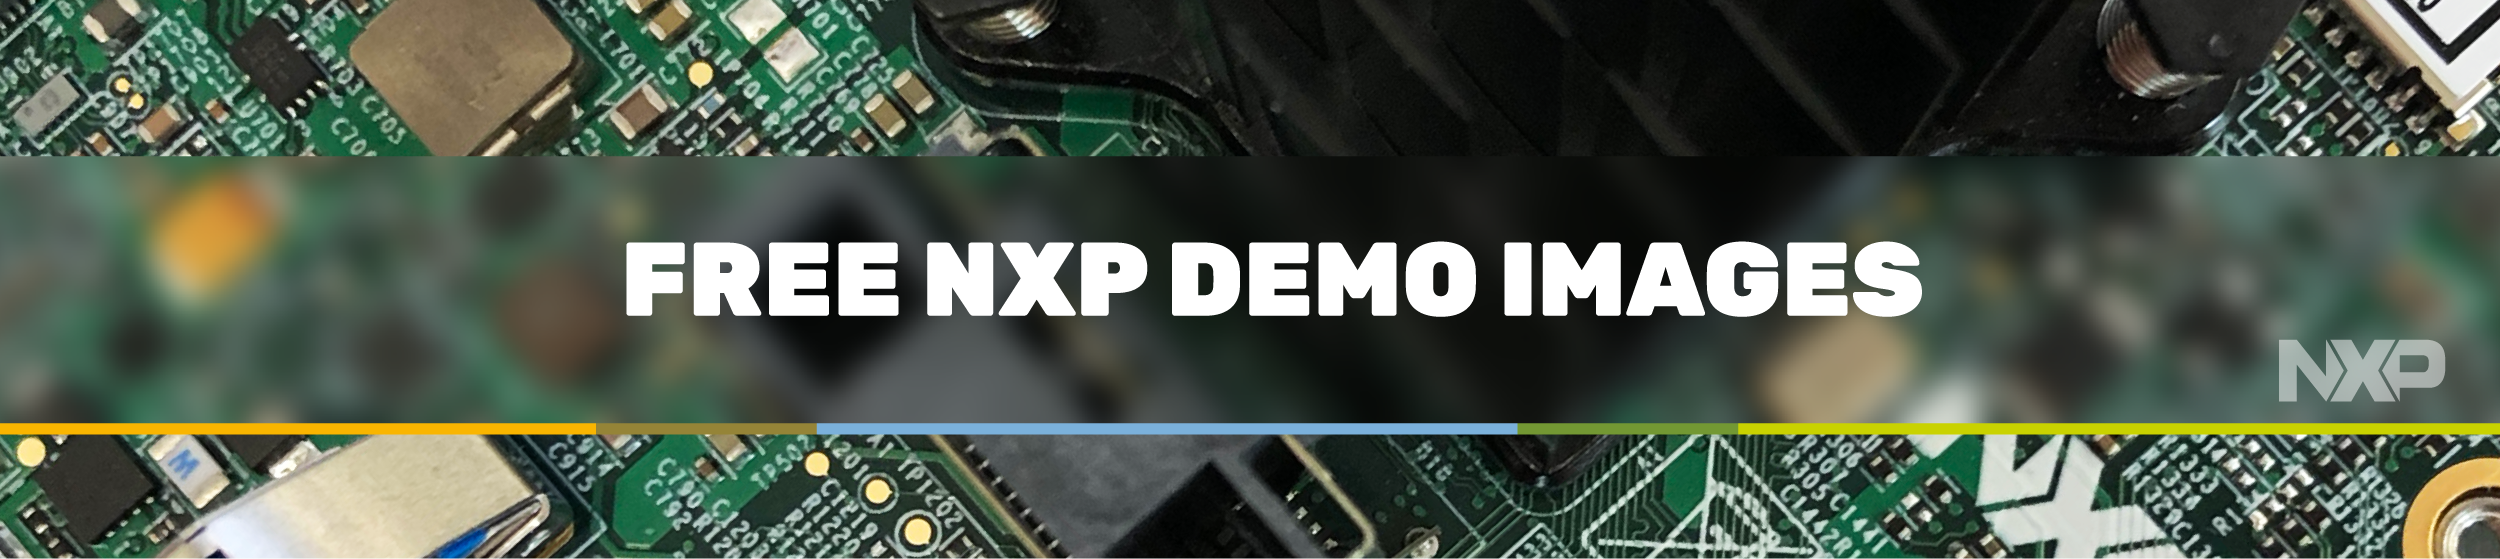 crank software nxp demo images storoyboard 2